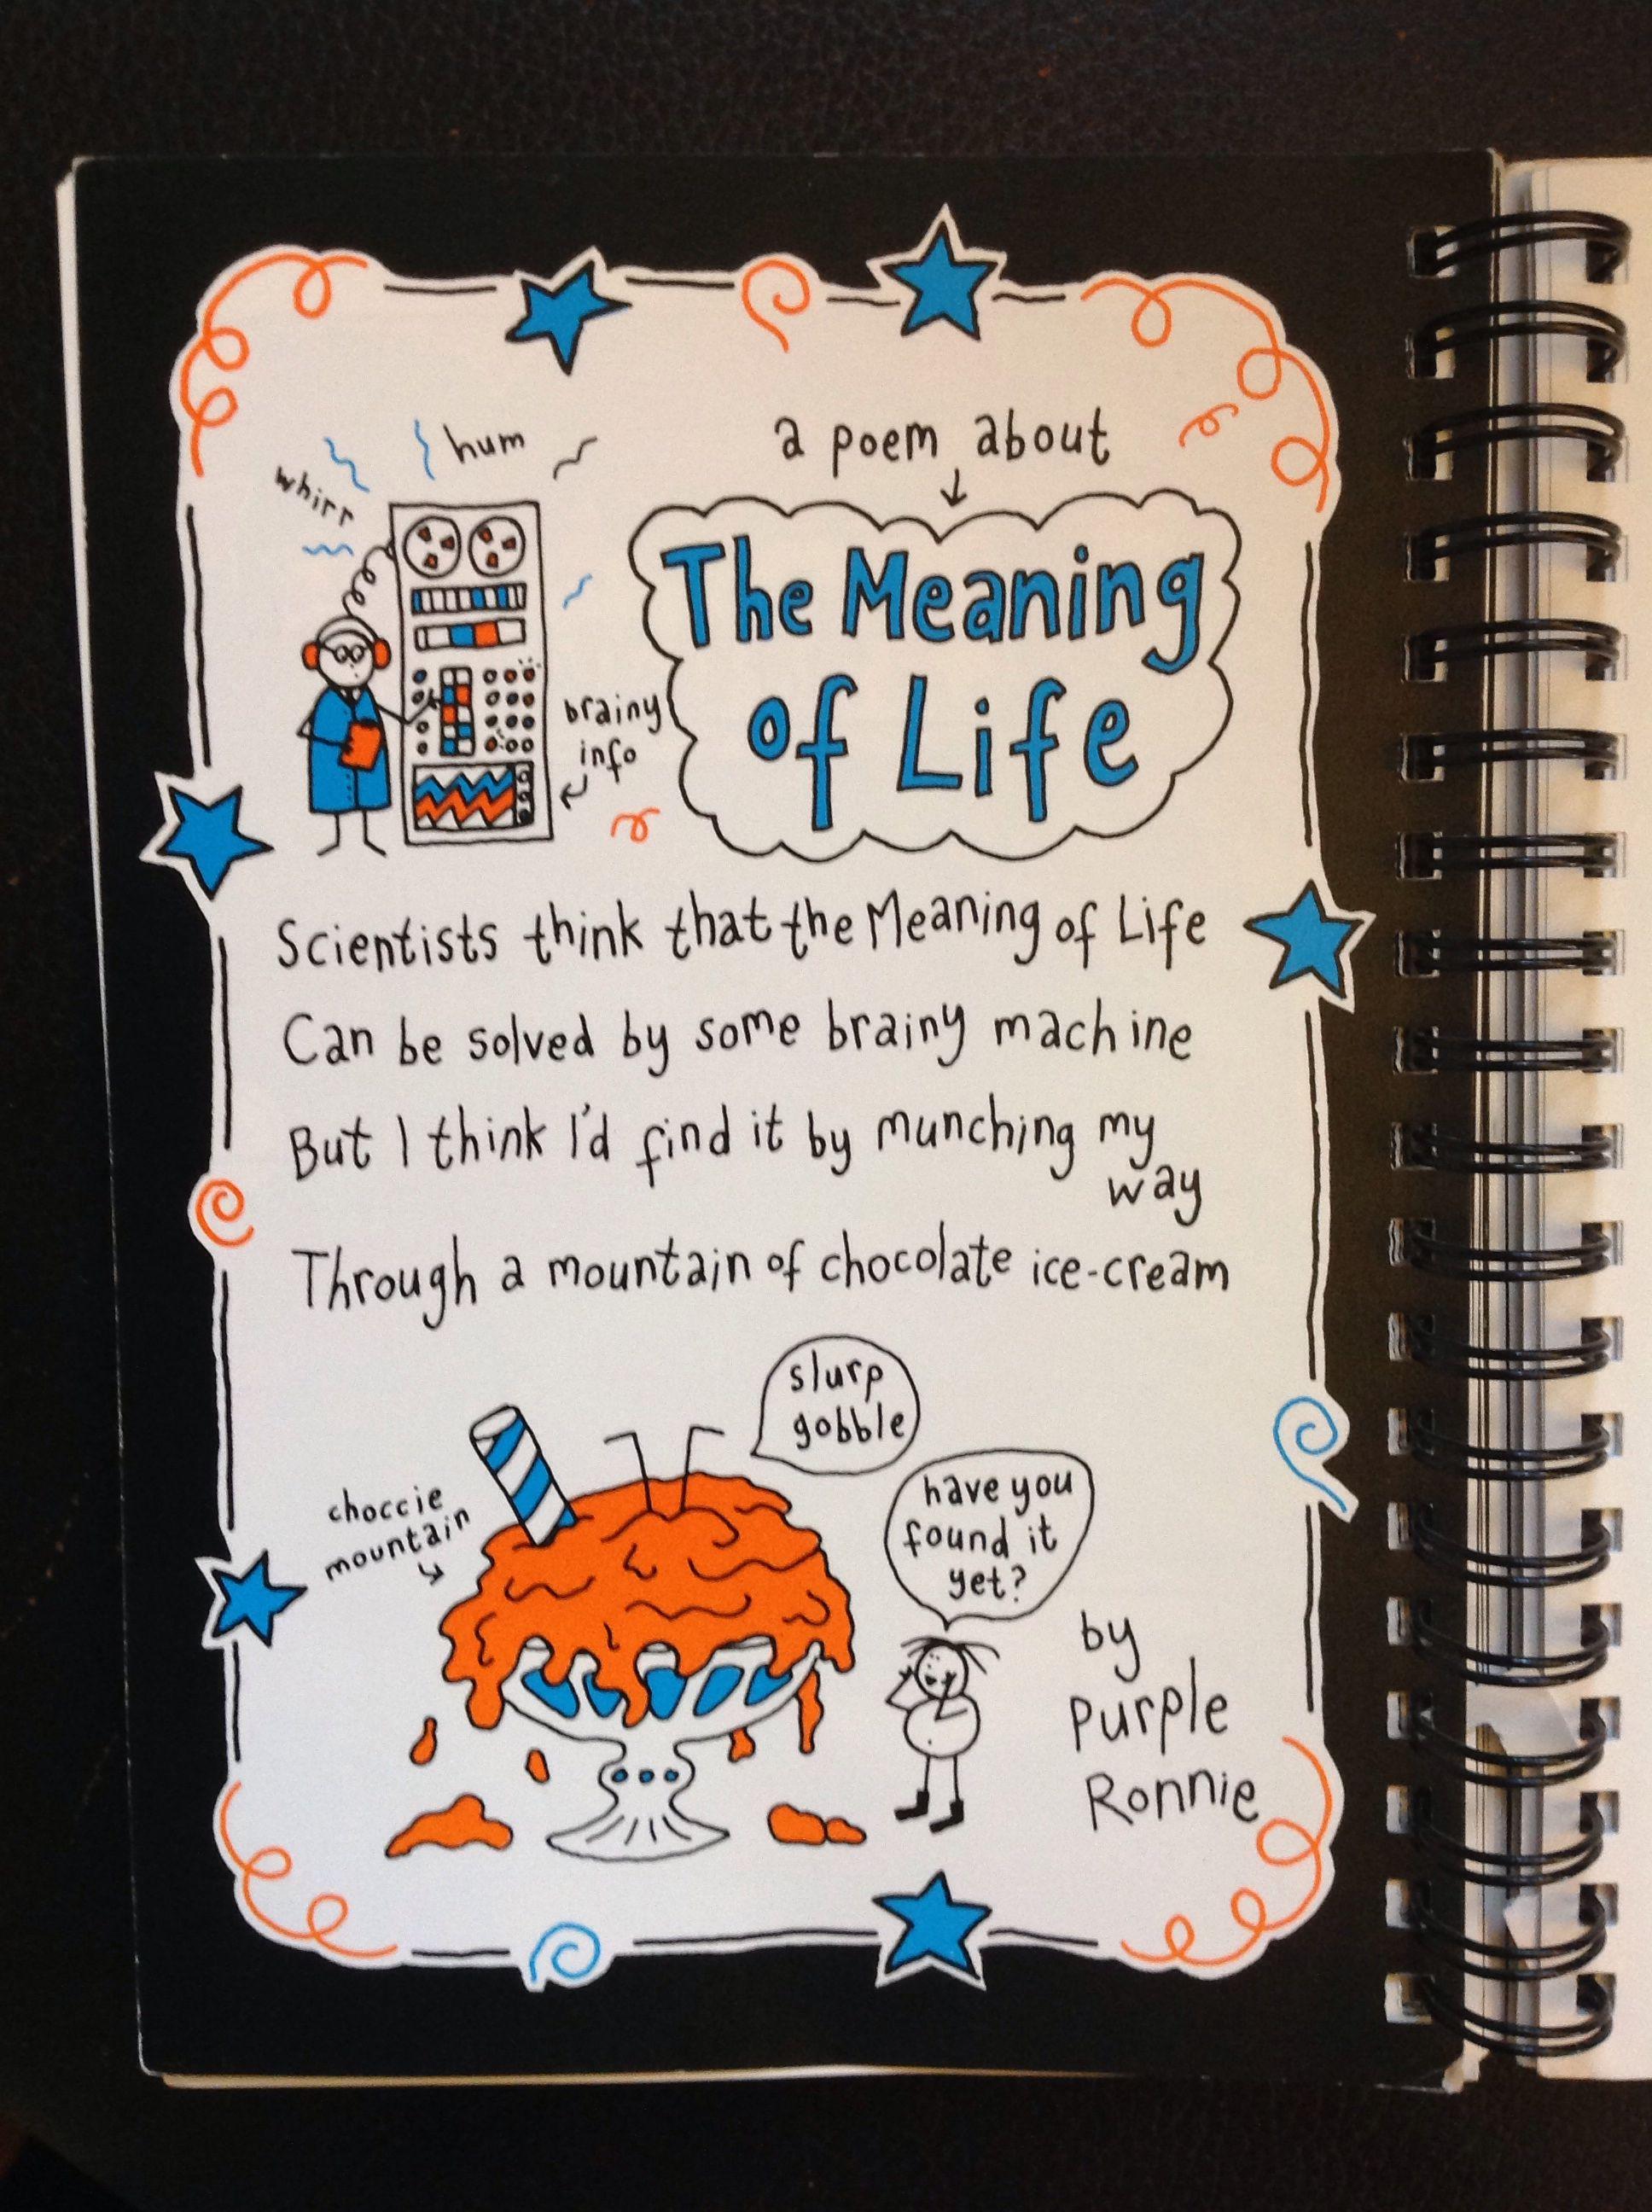 The Meaning of Life Meaning of life, Meant to be